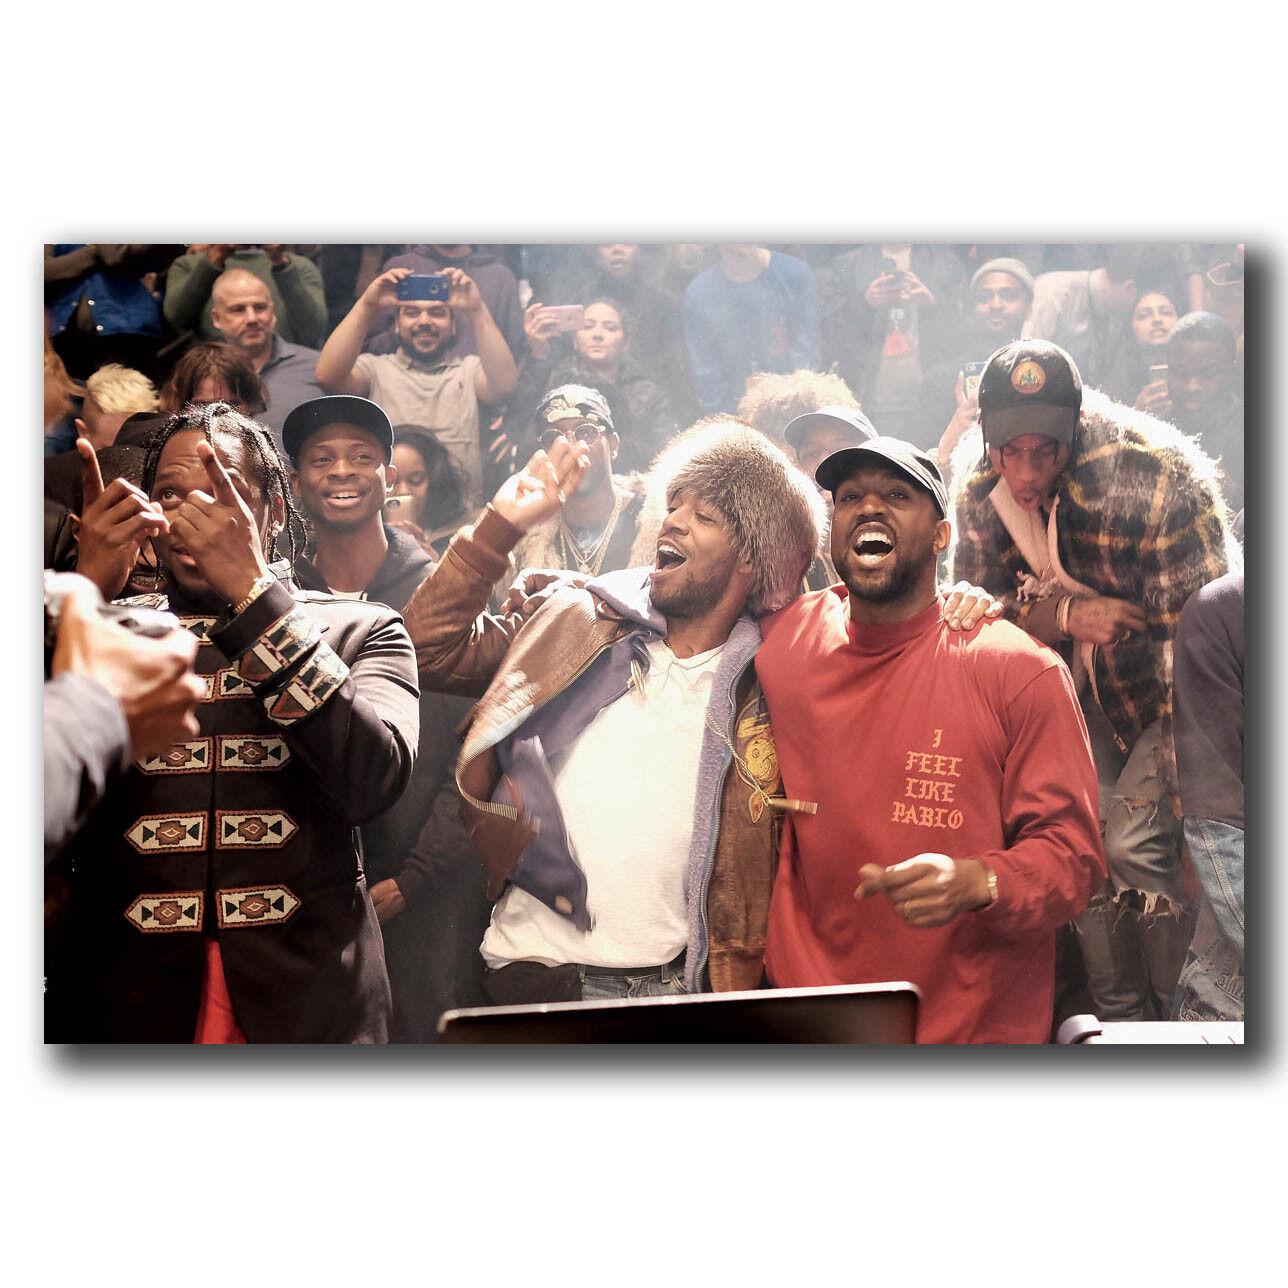 Art Kanye West The Life Of Pablo Rapper HipHop Super Star Poster 30 24x36 P374